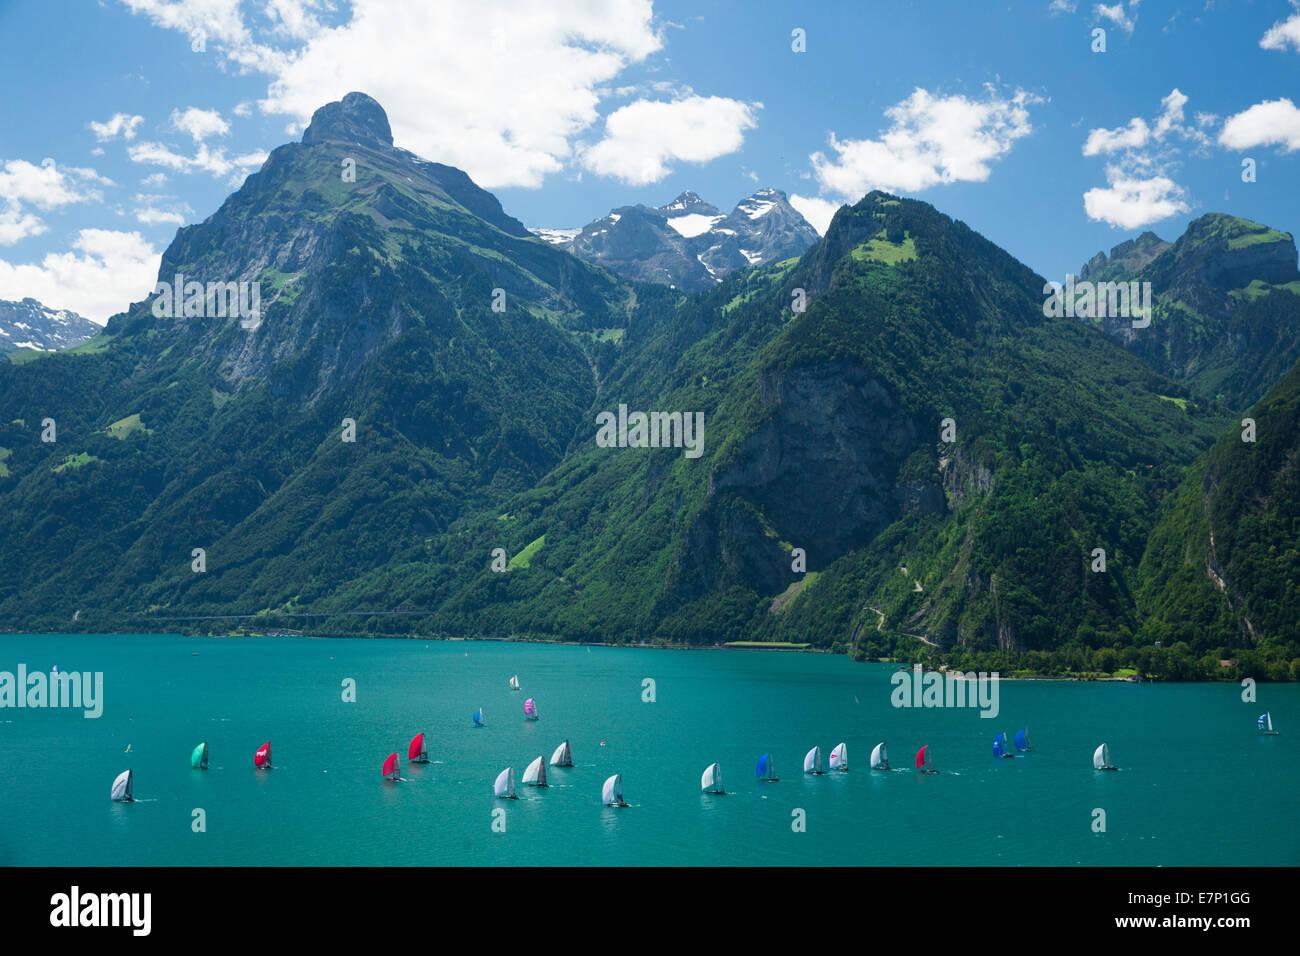 Lake Uri, yachting, regatta, Vierwaldstättersee, Lake Lucerne, sailing, sailboat, Water sport, Switzerland, - Stock Image